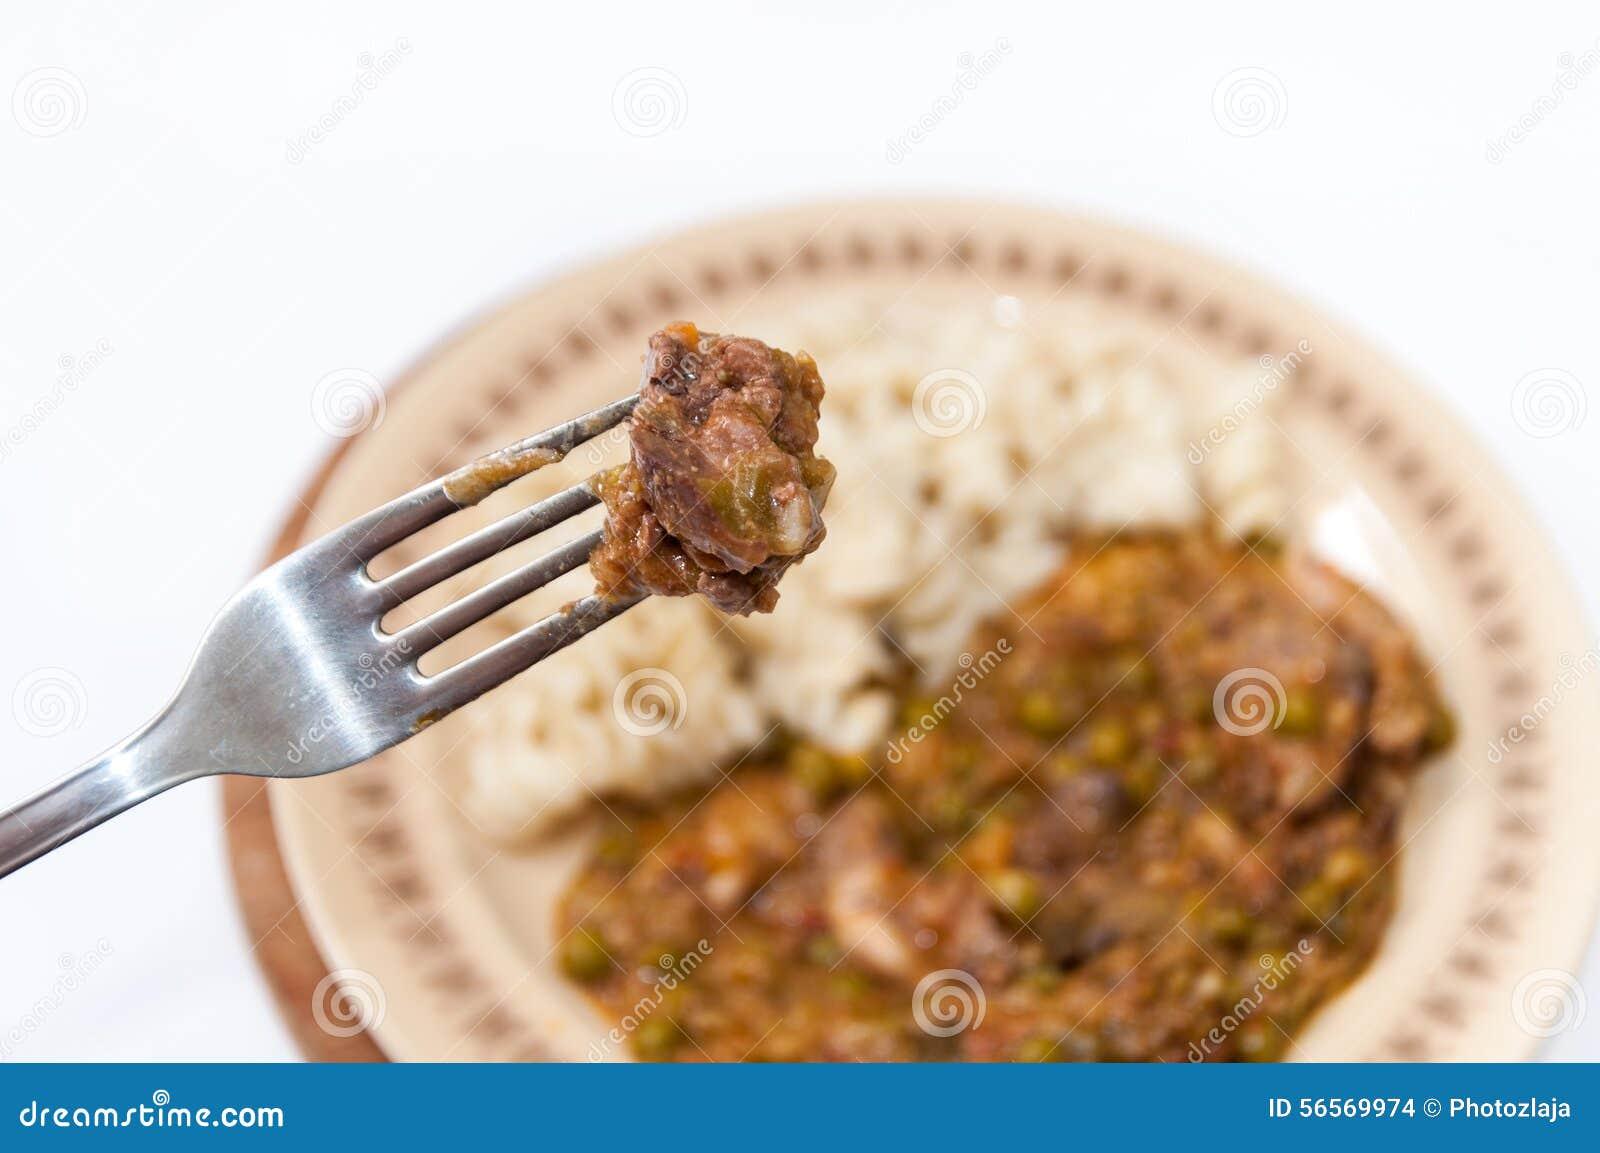 Download Μαγειρευμένα συκώτια κοτόπουλου στο δίκρανο στην εστίαση Στοκ Εικόνες - εικόνα από μπιζέλι, ορεκτικός: 56569974